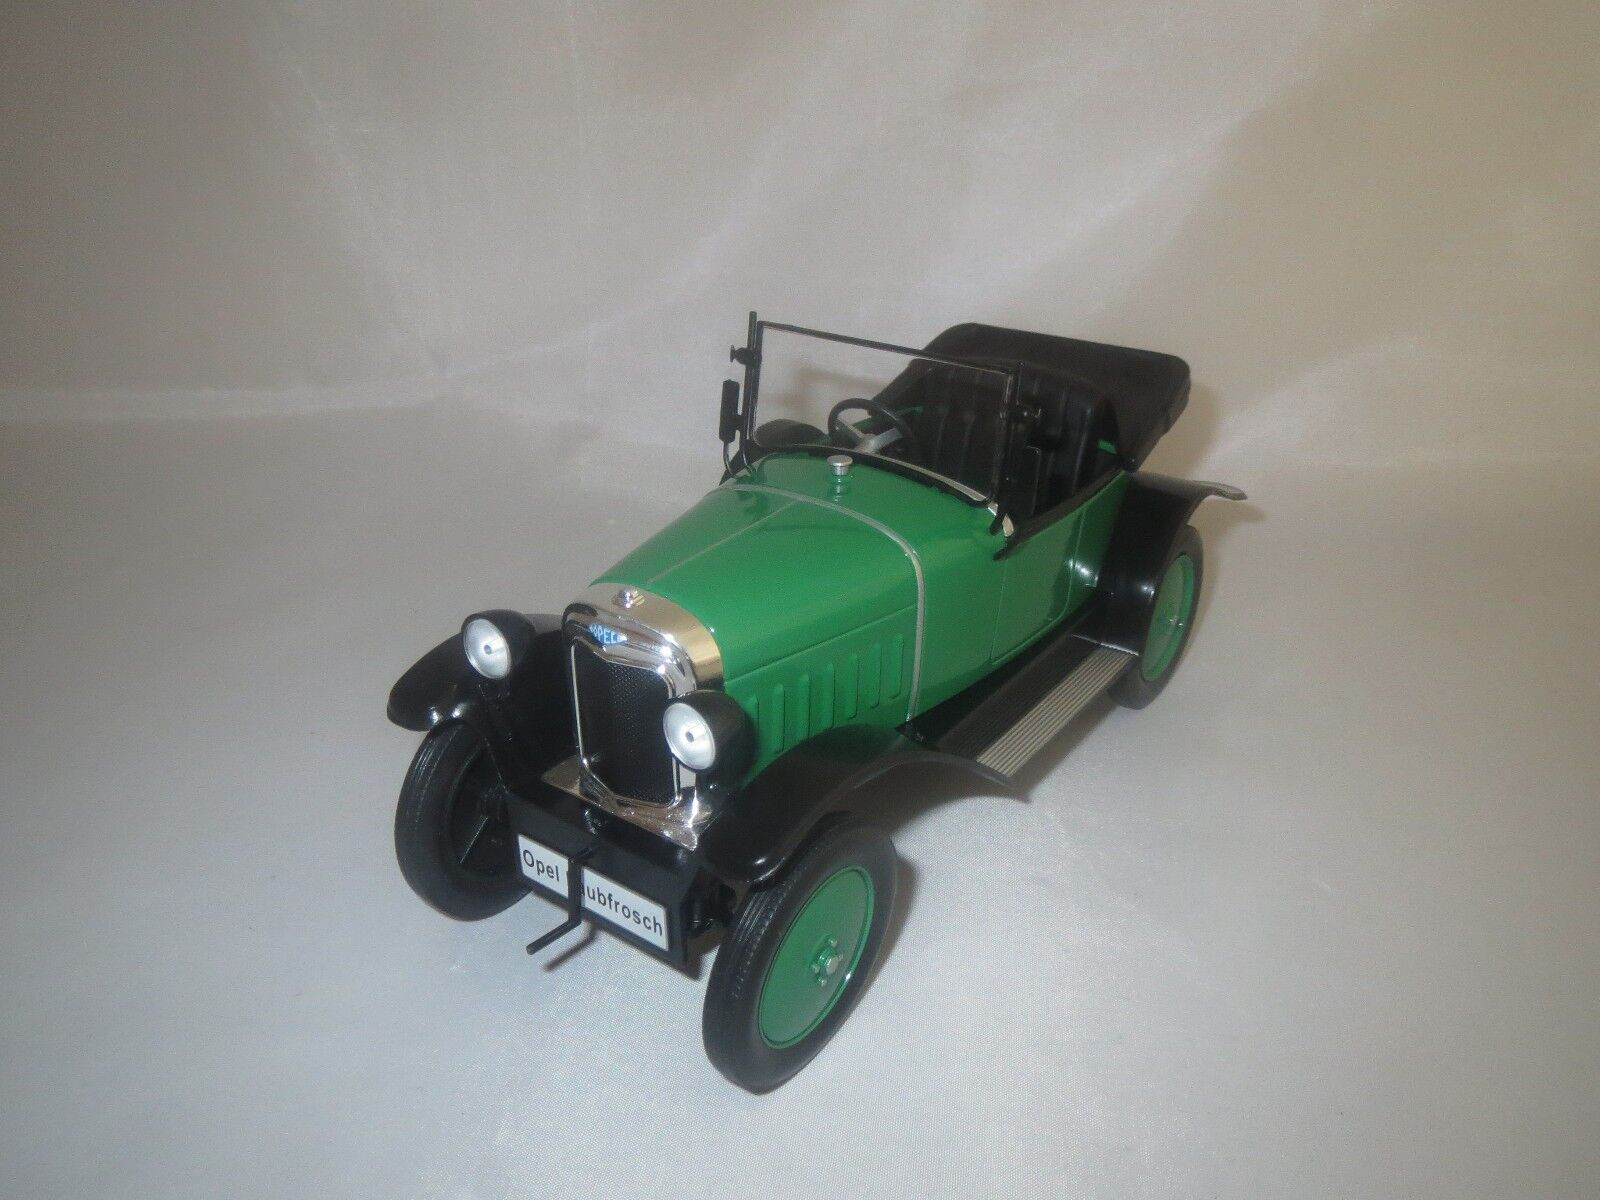 gran descuento ModelCoche Group Opel Laubfrosch (verde negro) negro) negro) 1 18 sin embalaje   tienda en linea